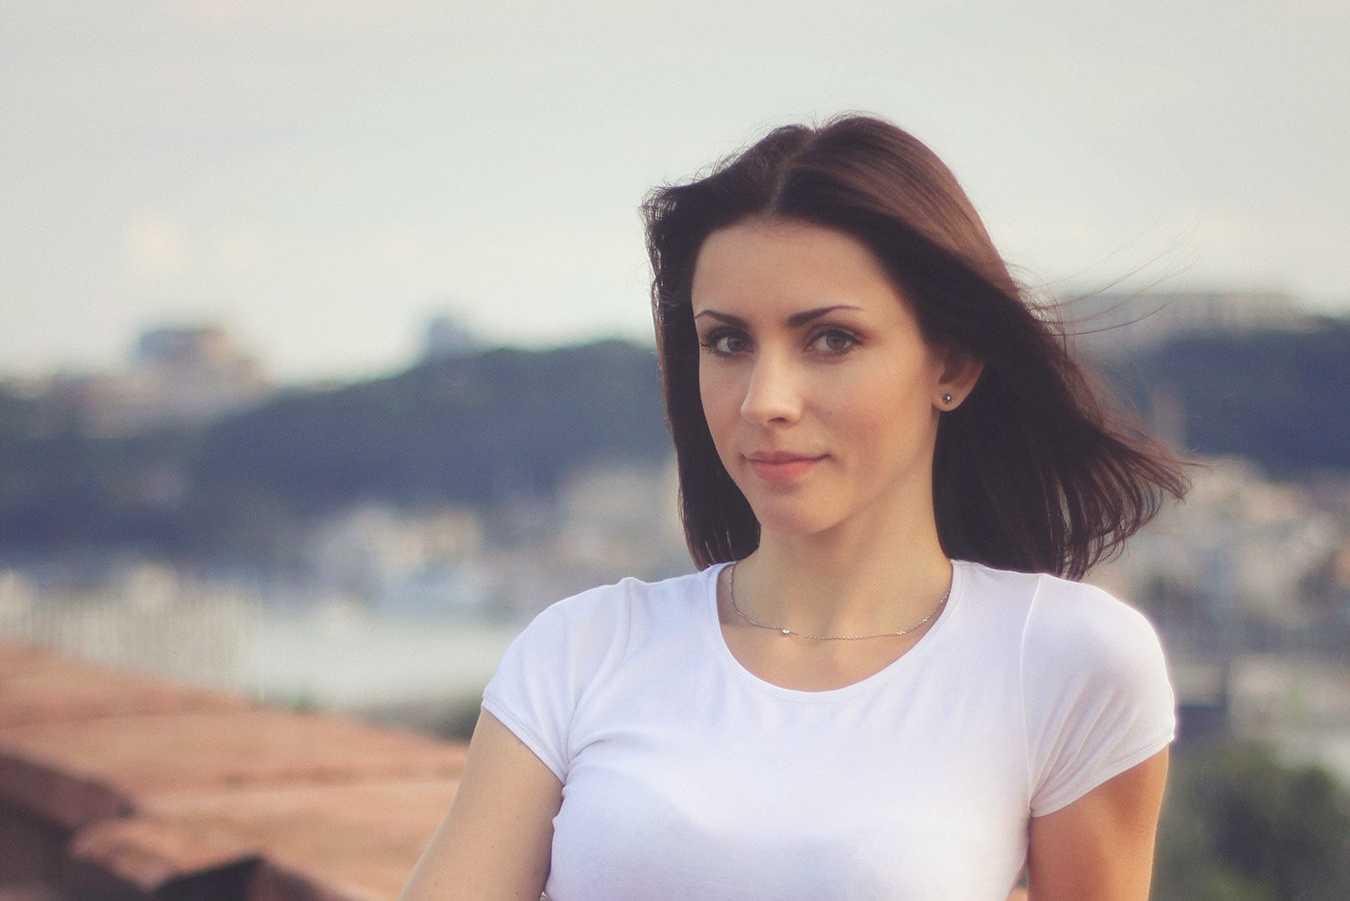 Фото татьяны даниленко